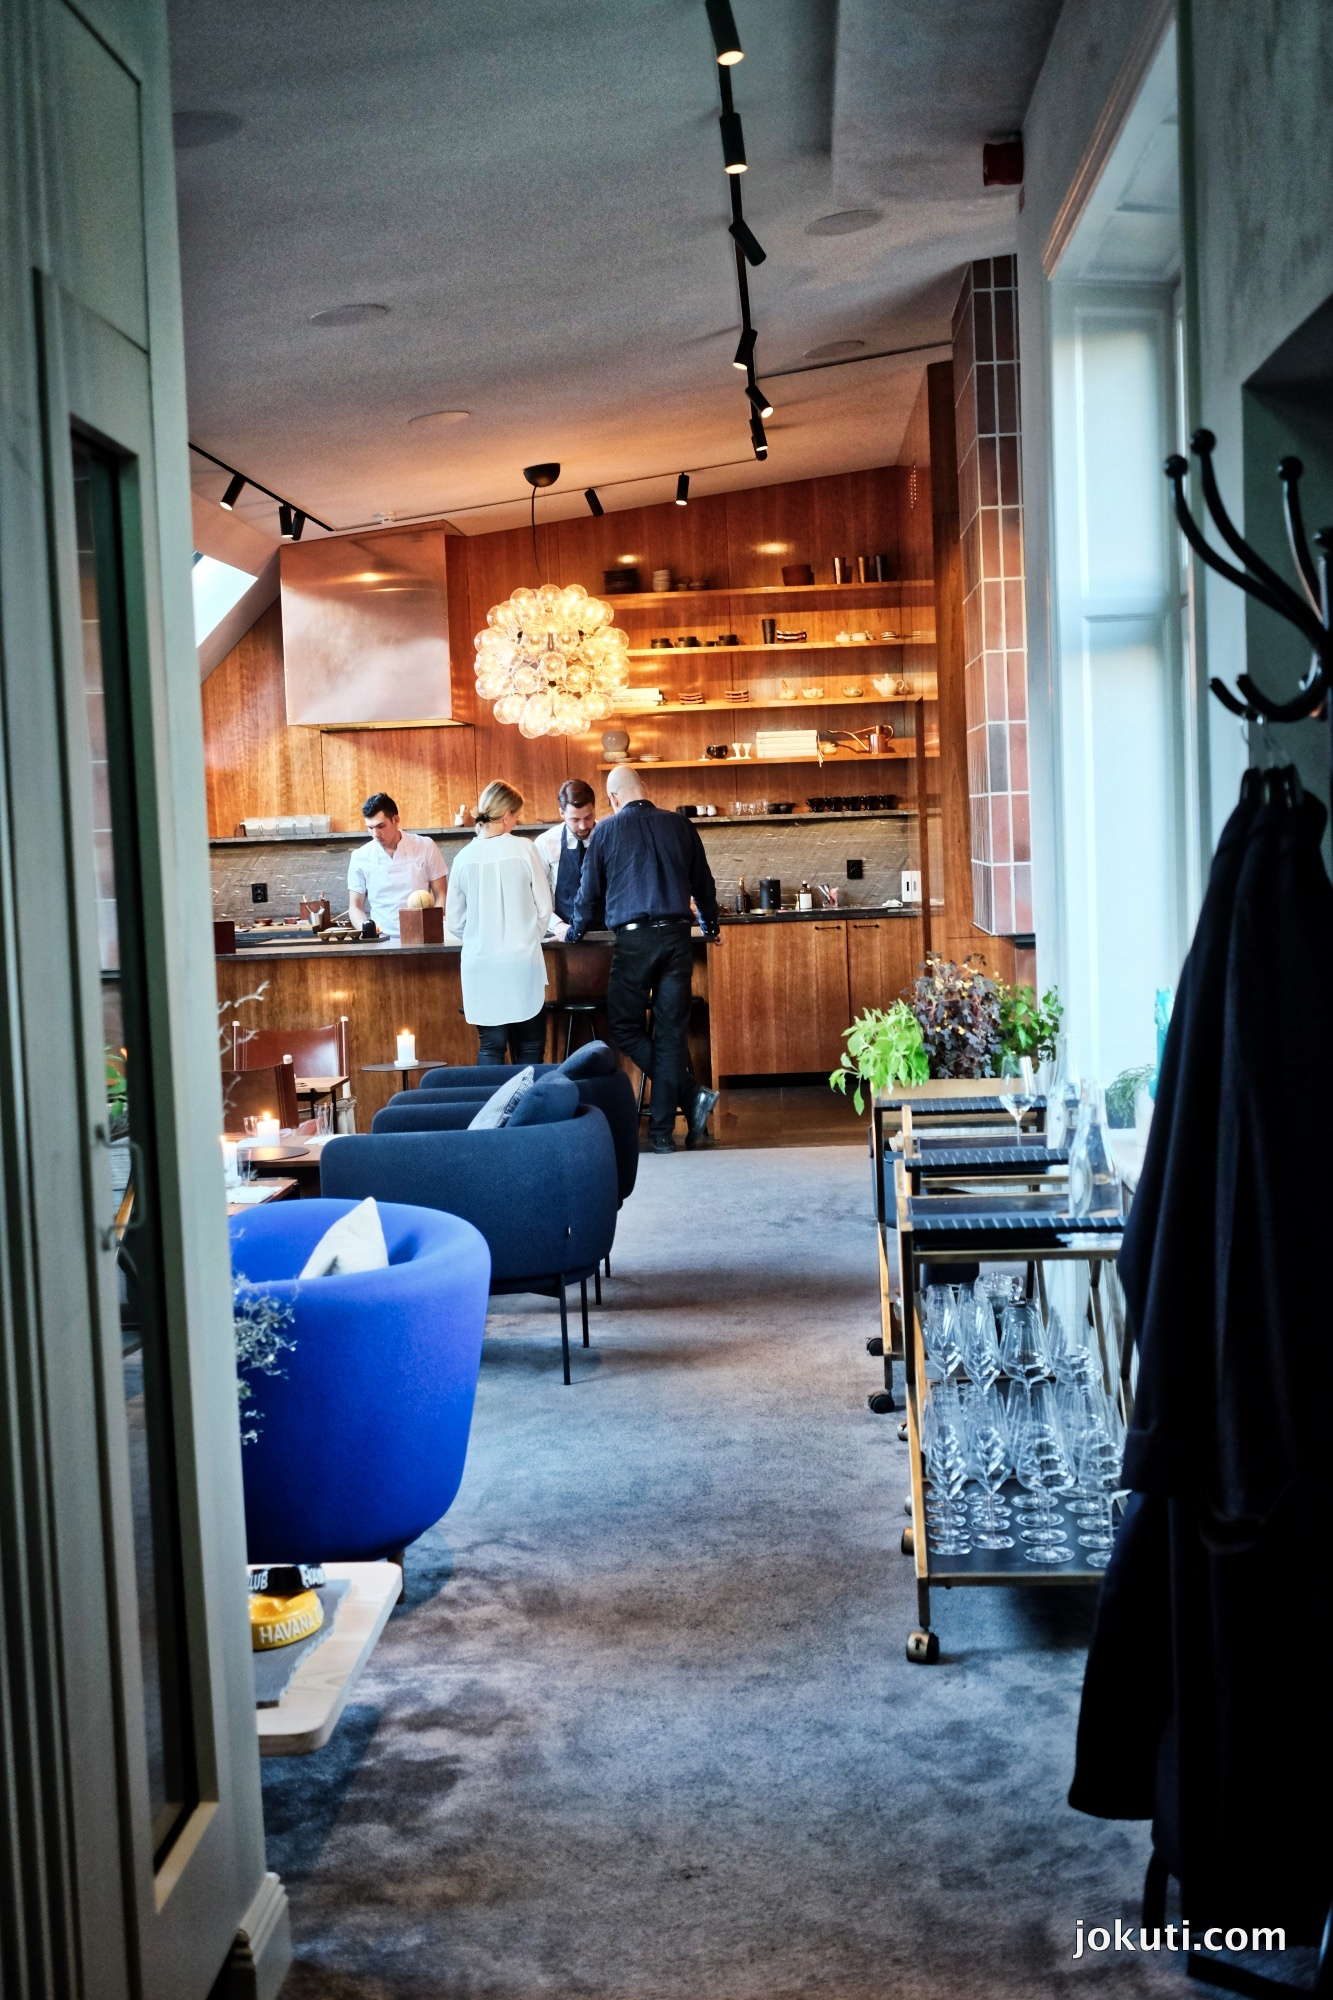 dscf5464_frantzen_stockholm_restaurant_michelin_stars_sweden_vilagevo_jokuti_l.jpg